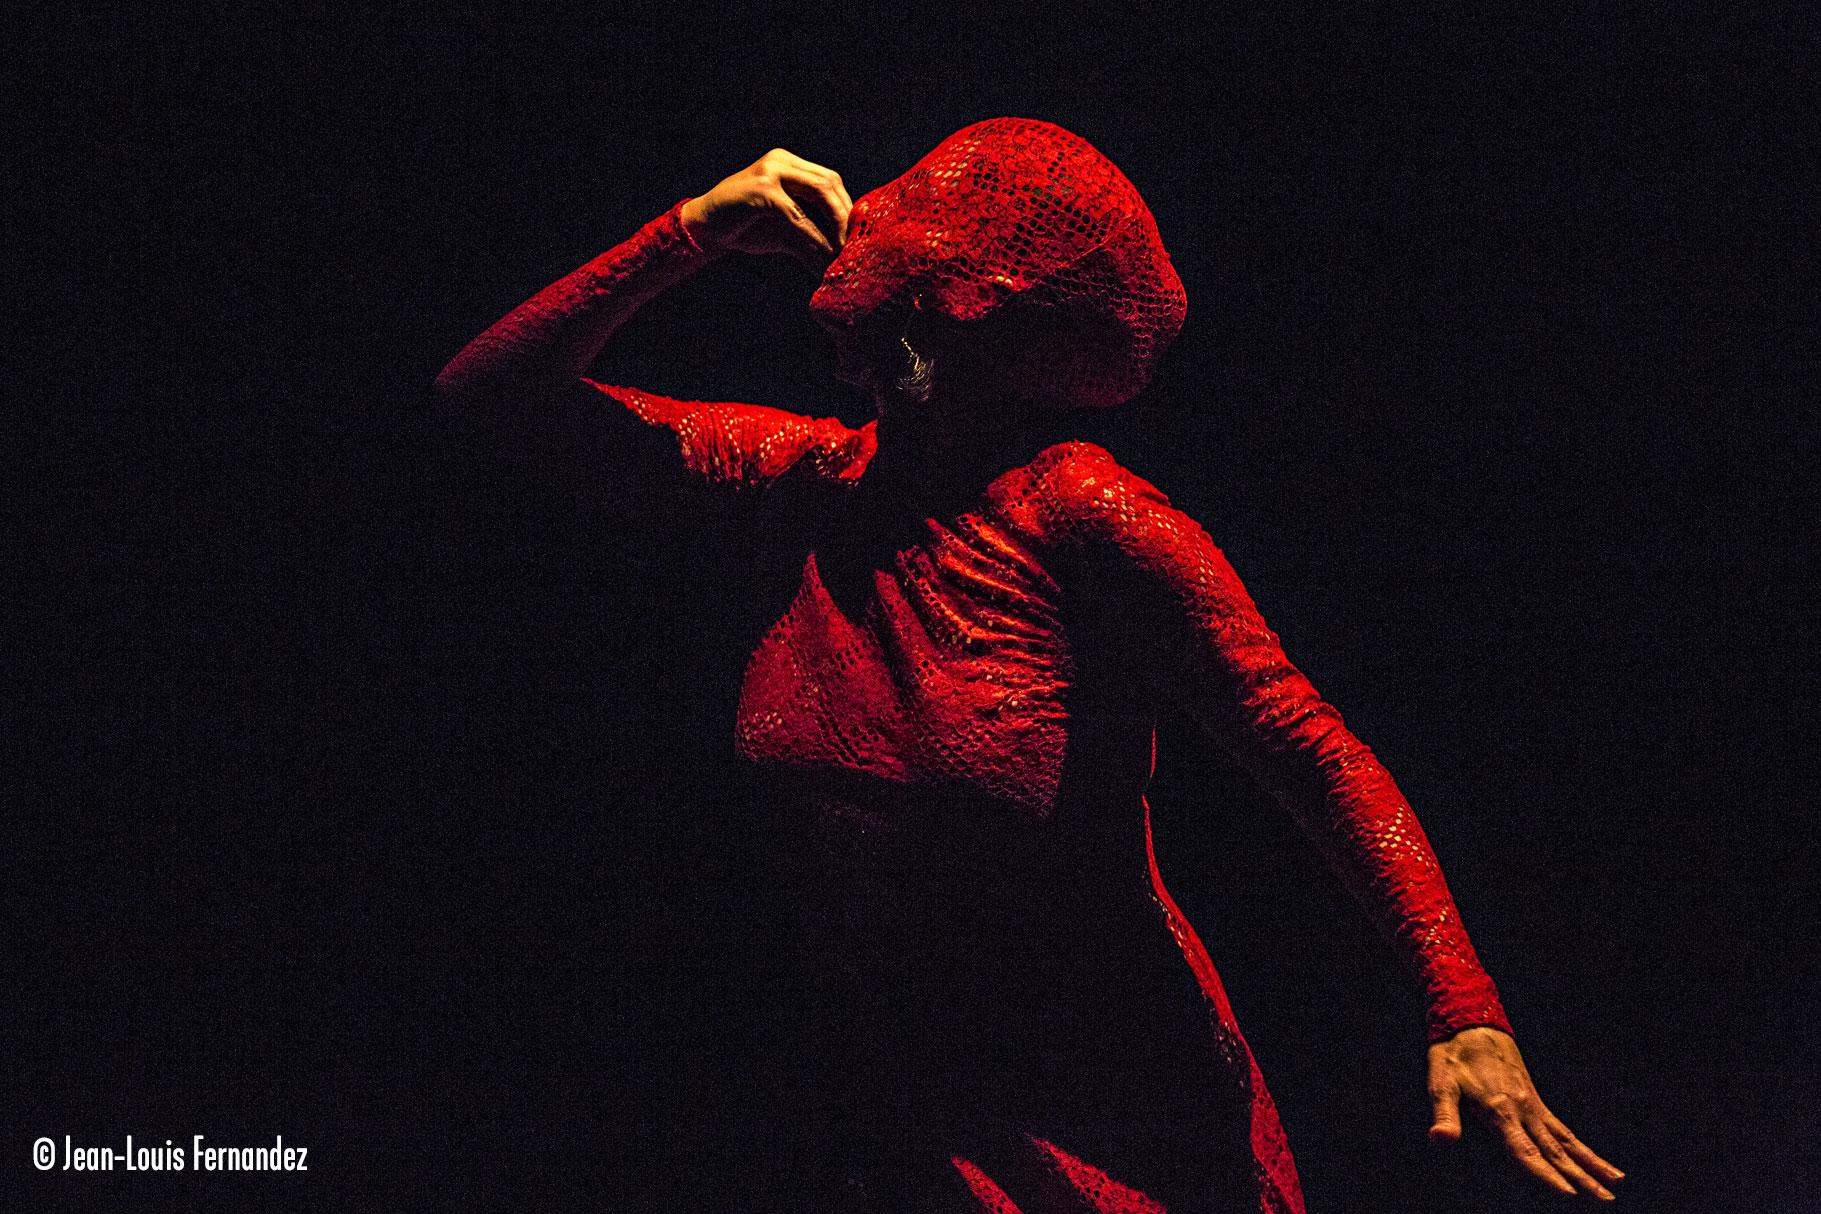 Devaste Moi, Emmanuelle Laborit, Copyright Jean-Louis Fernandez